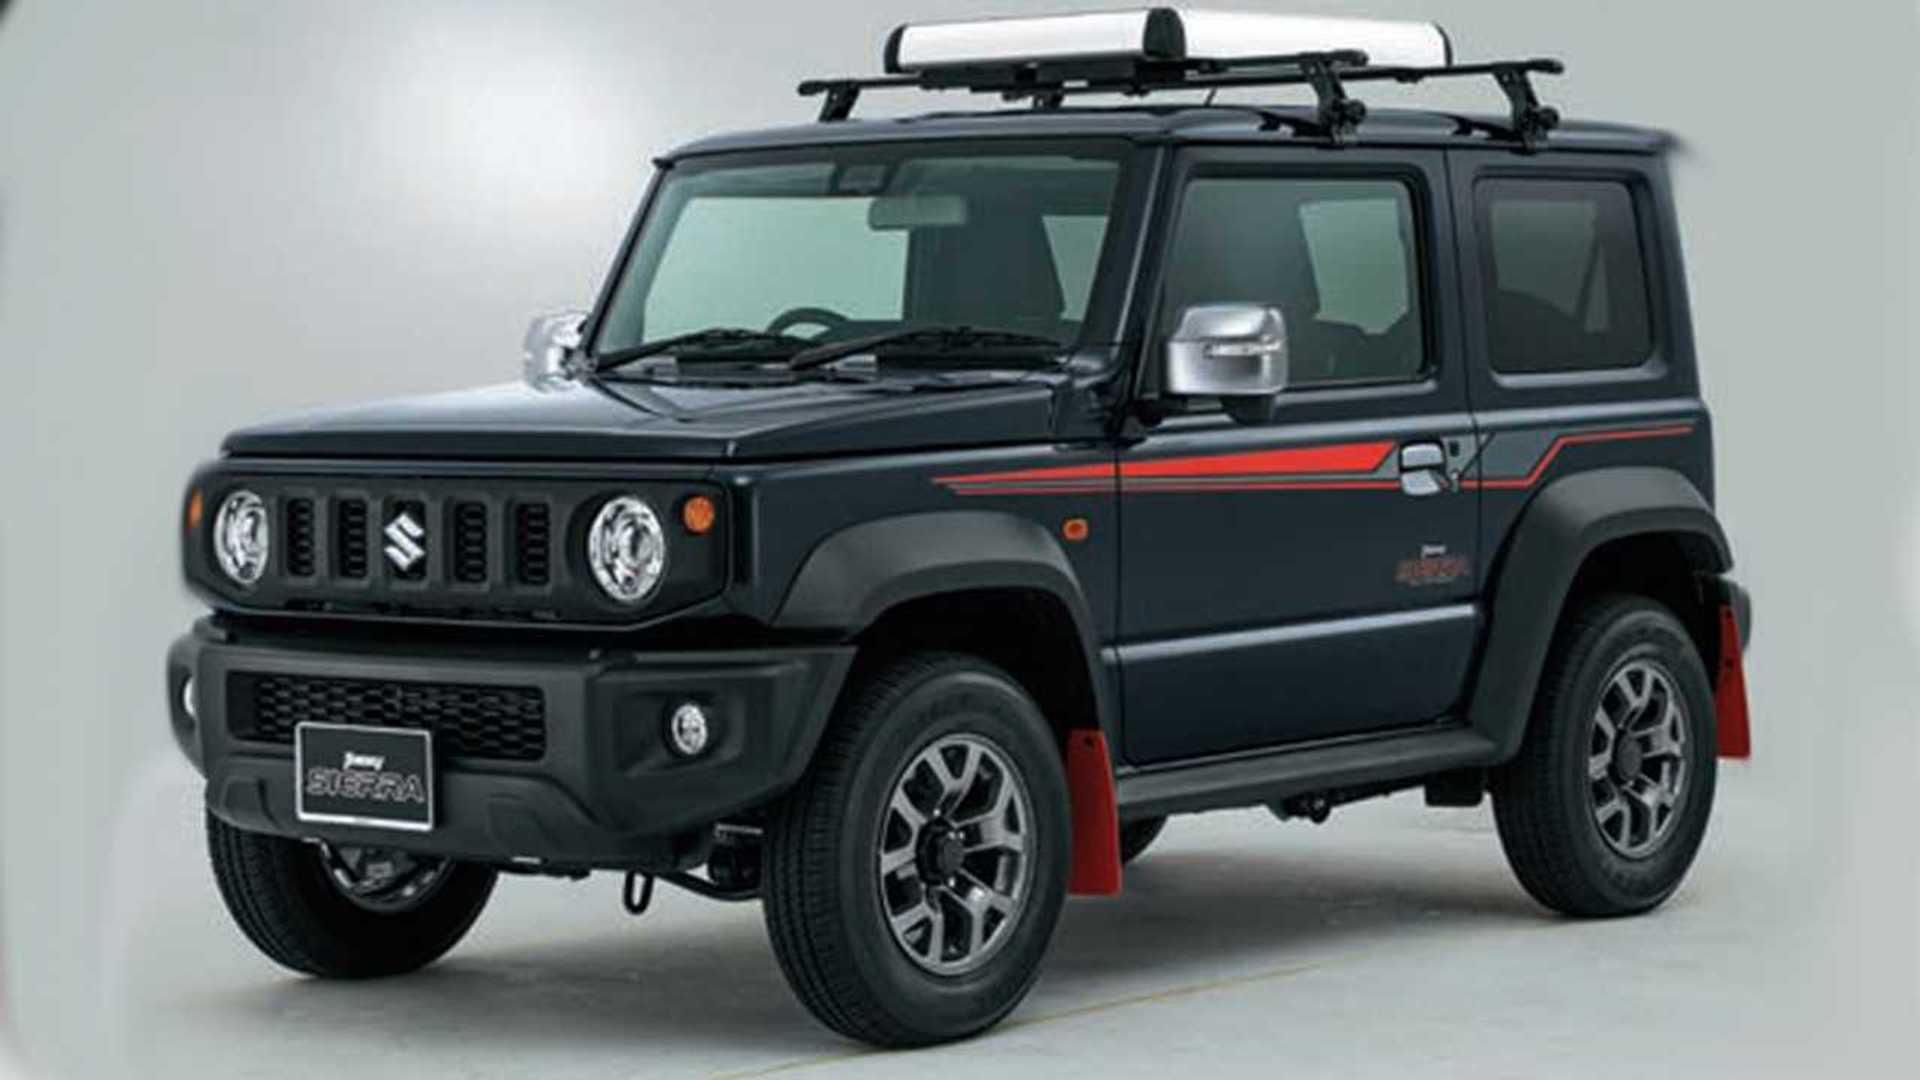 2020 Suzuki Jimny Model Redesign and Concept